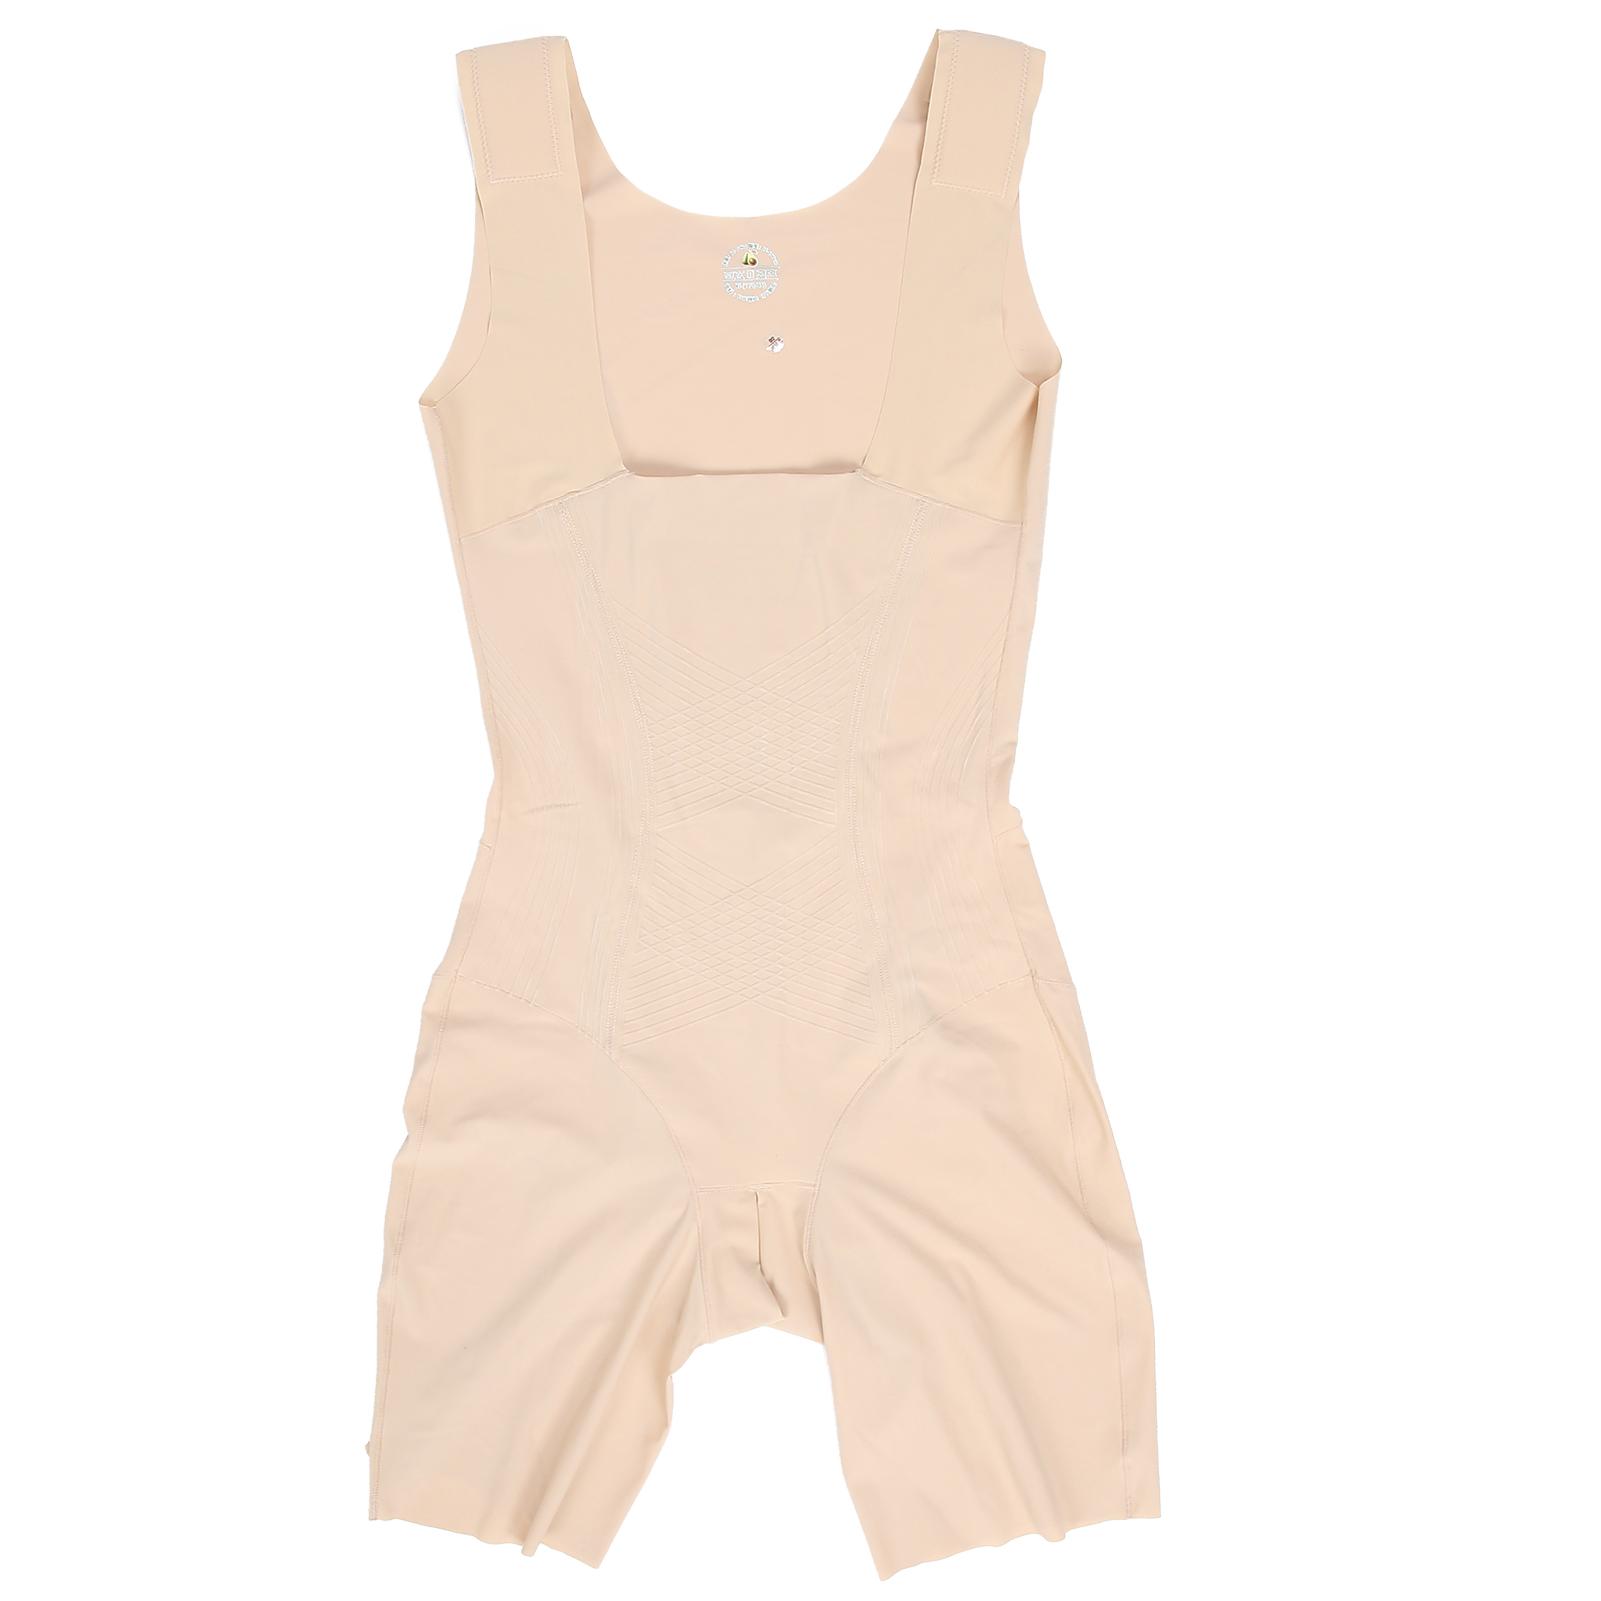 miniature 25 - Women's Full Body Taille Trainer Shaper Taille Corset underbust corset shapewear